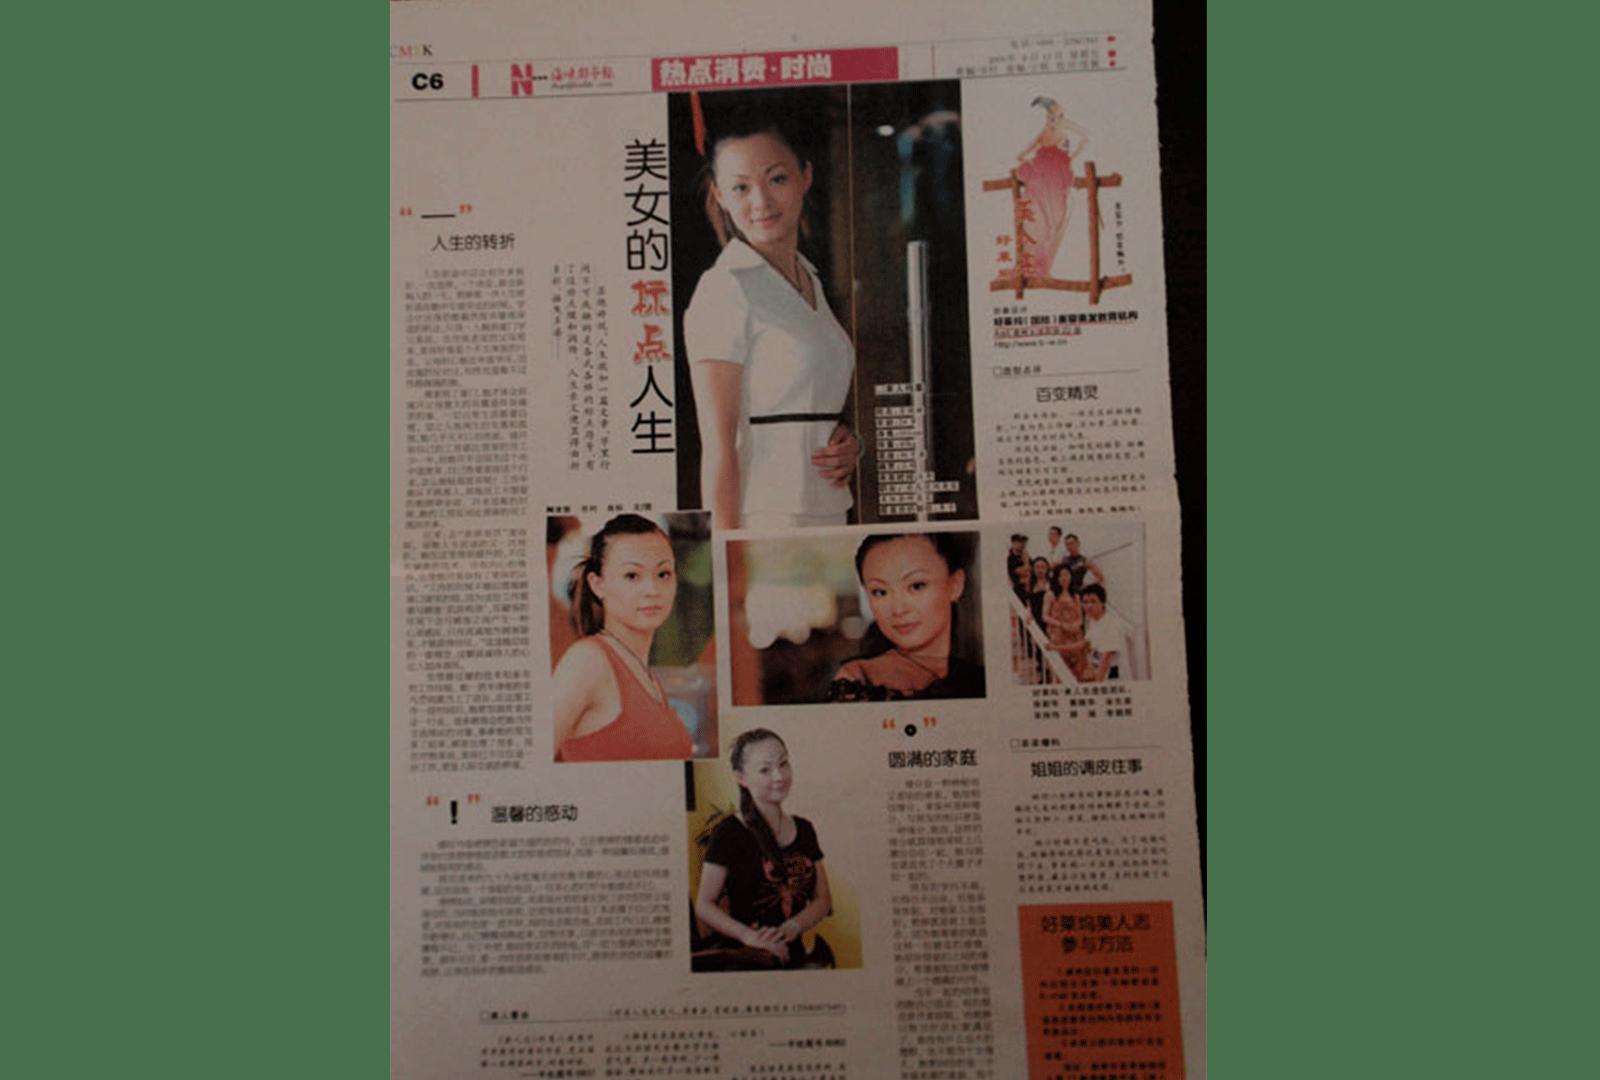 _0000s_0008_海峡都市报-2005-8-12-热点消费·时尚